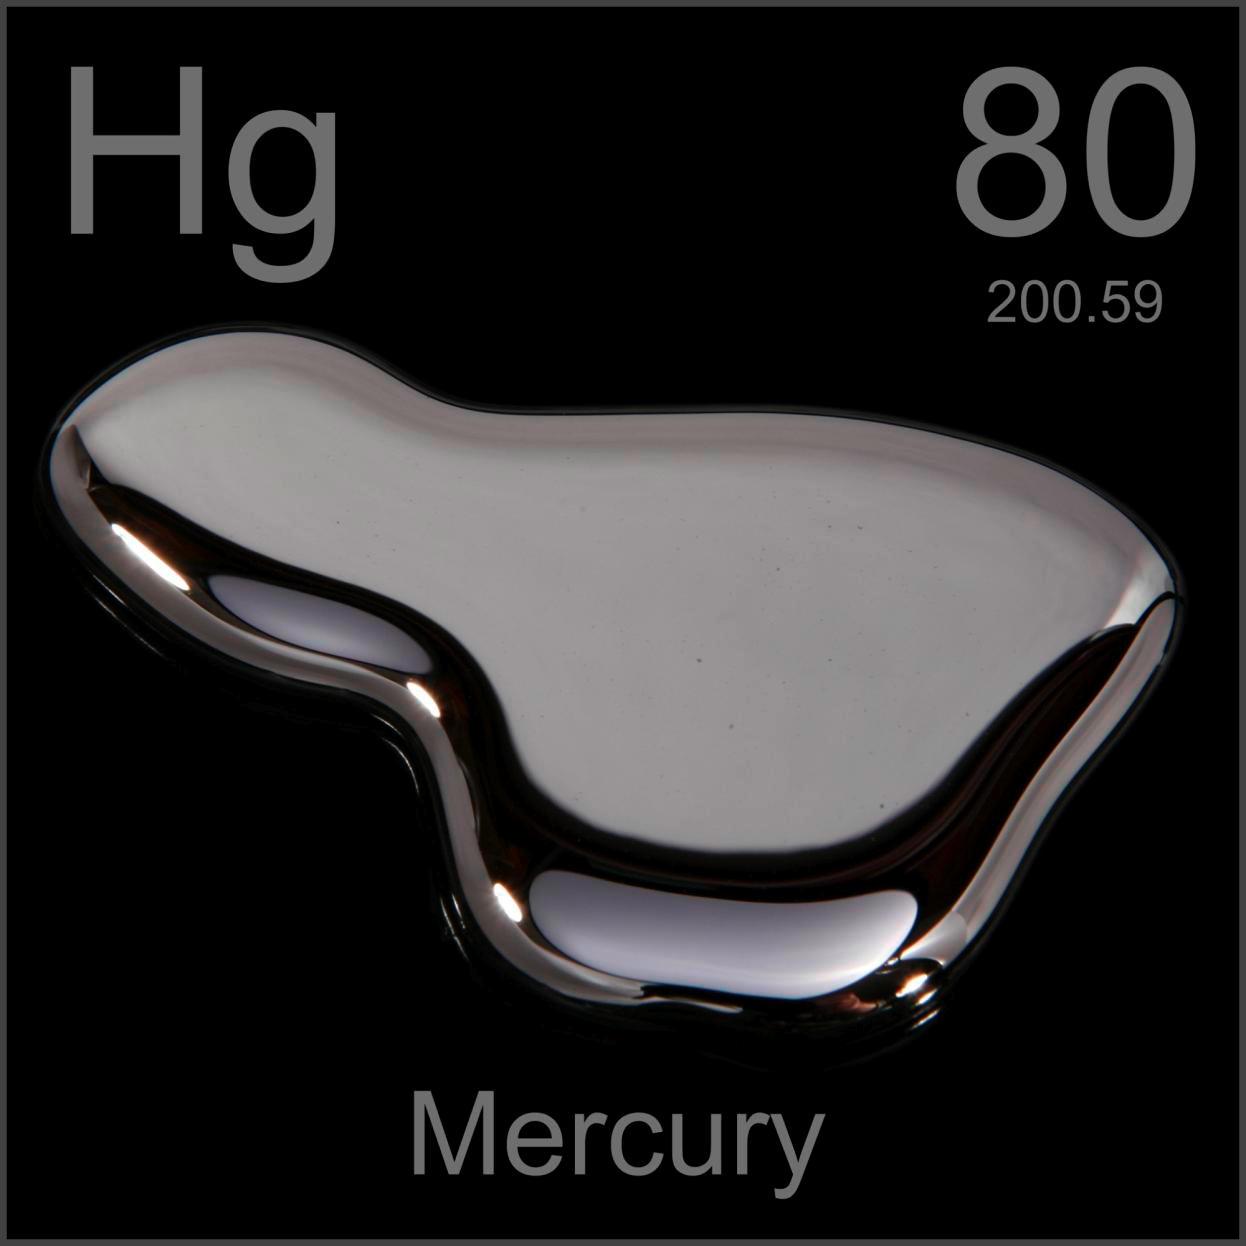 Mercury Hg Sale on PSN Mercury Hg Sale on PSN 4270SquallSnake7